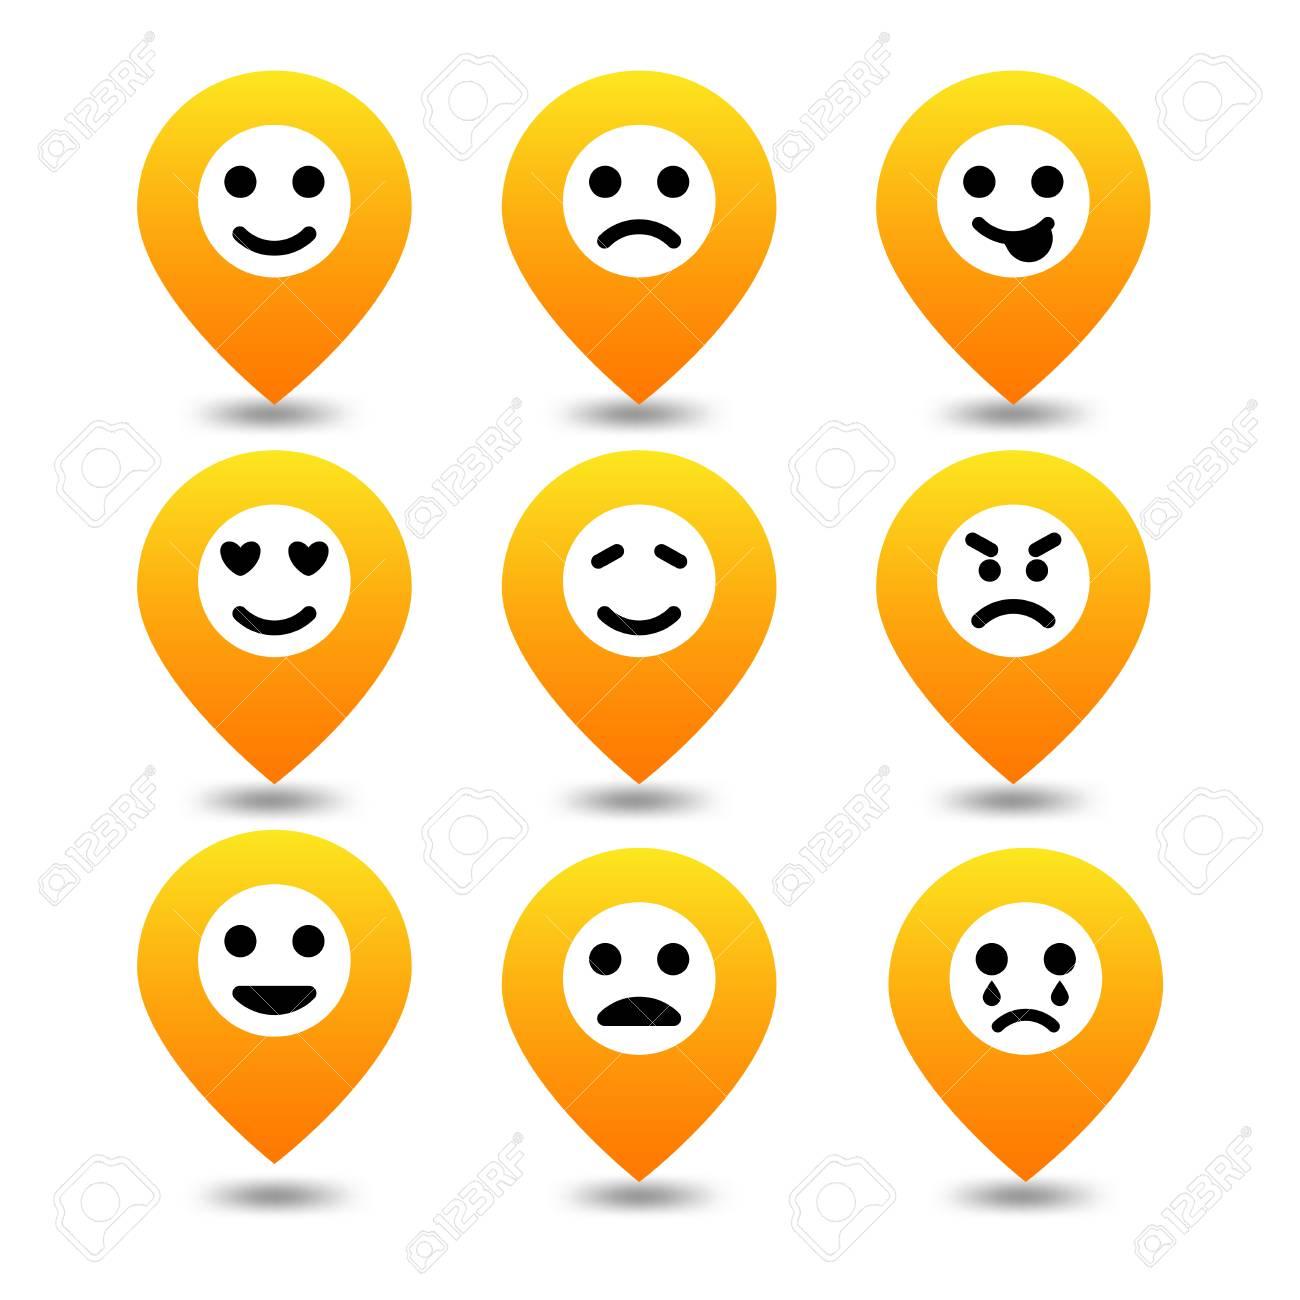 Icon set emoji pin location expressions of emotion